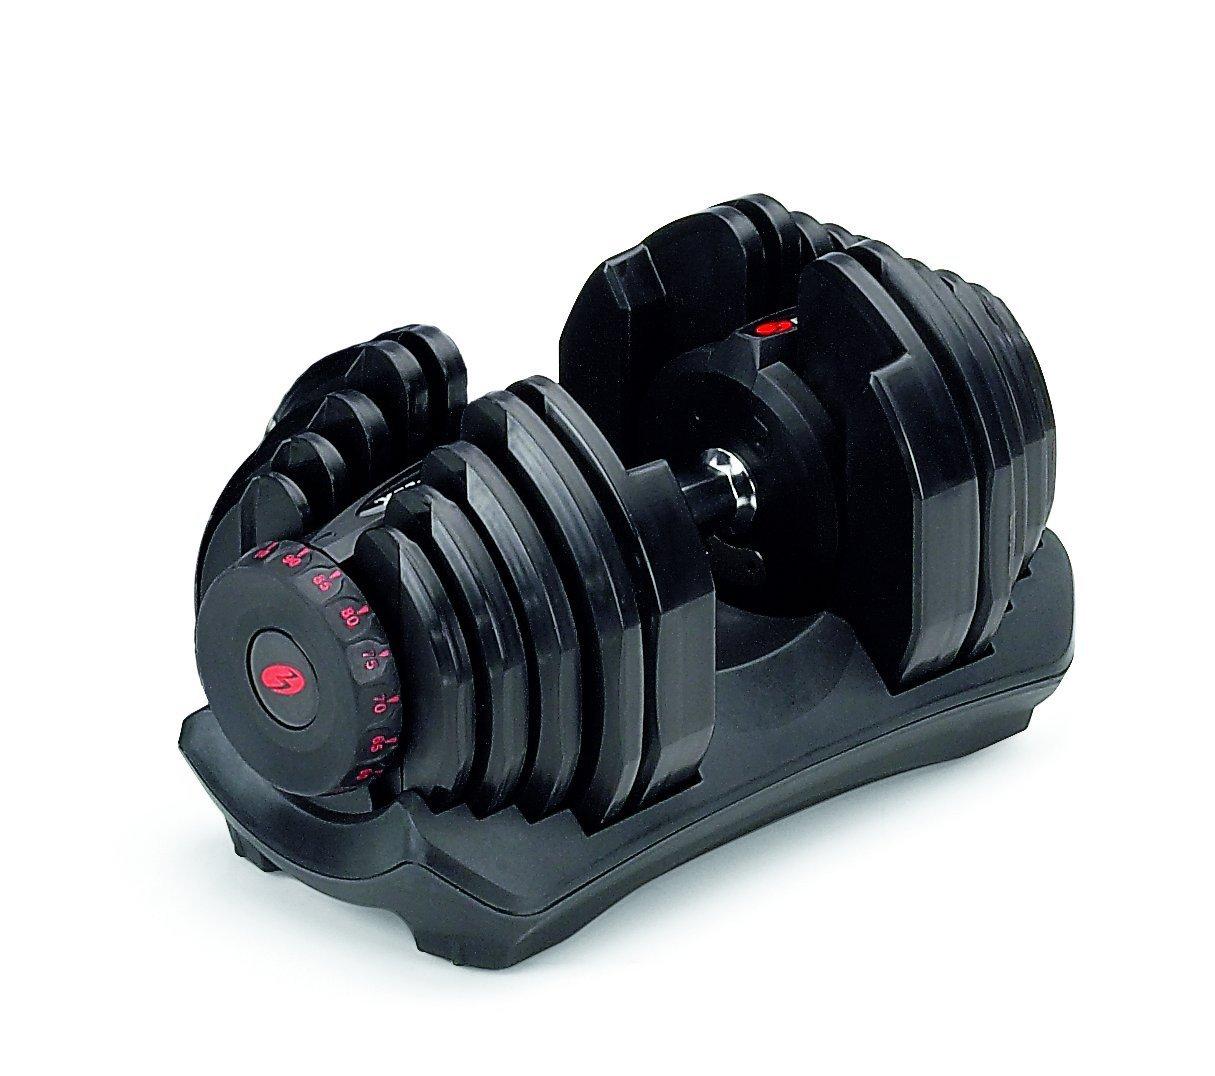 Bowflex SelectTech 1090 Dumbbell (qty one) $199